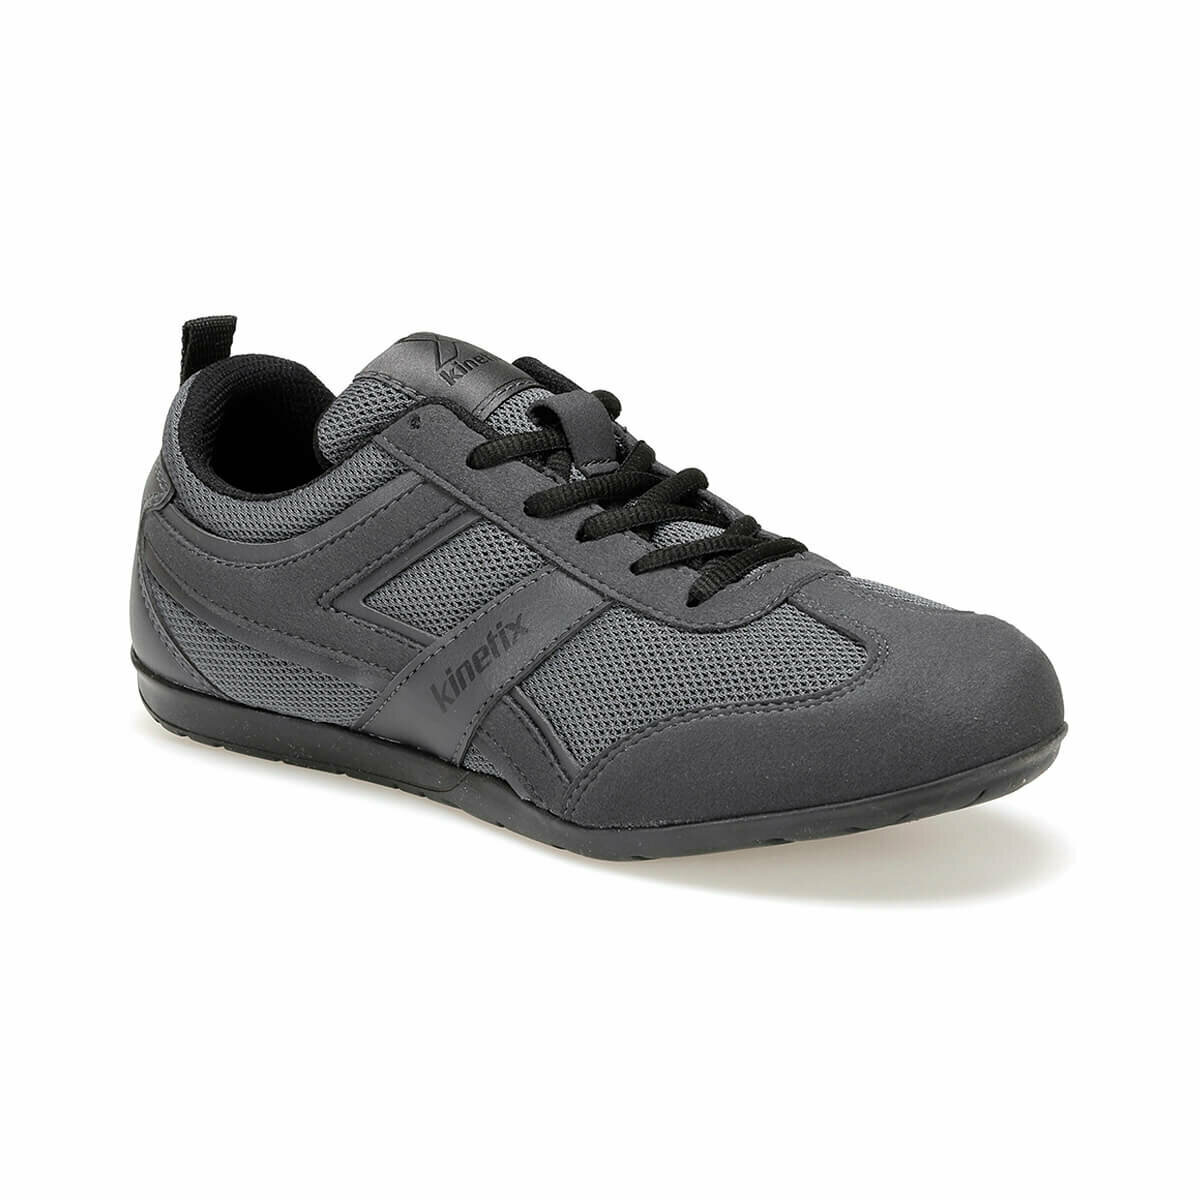 FLO WALTER M Black Men 'S Sneaker Shoes KINETIX